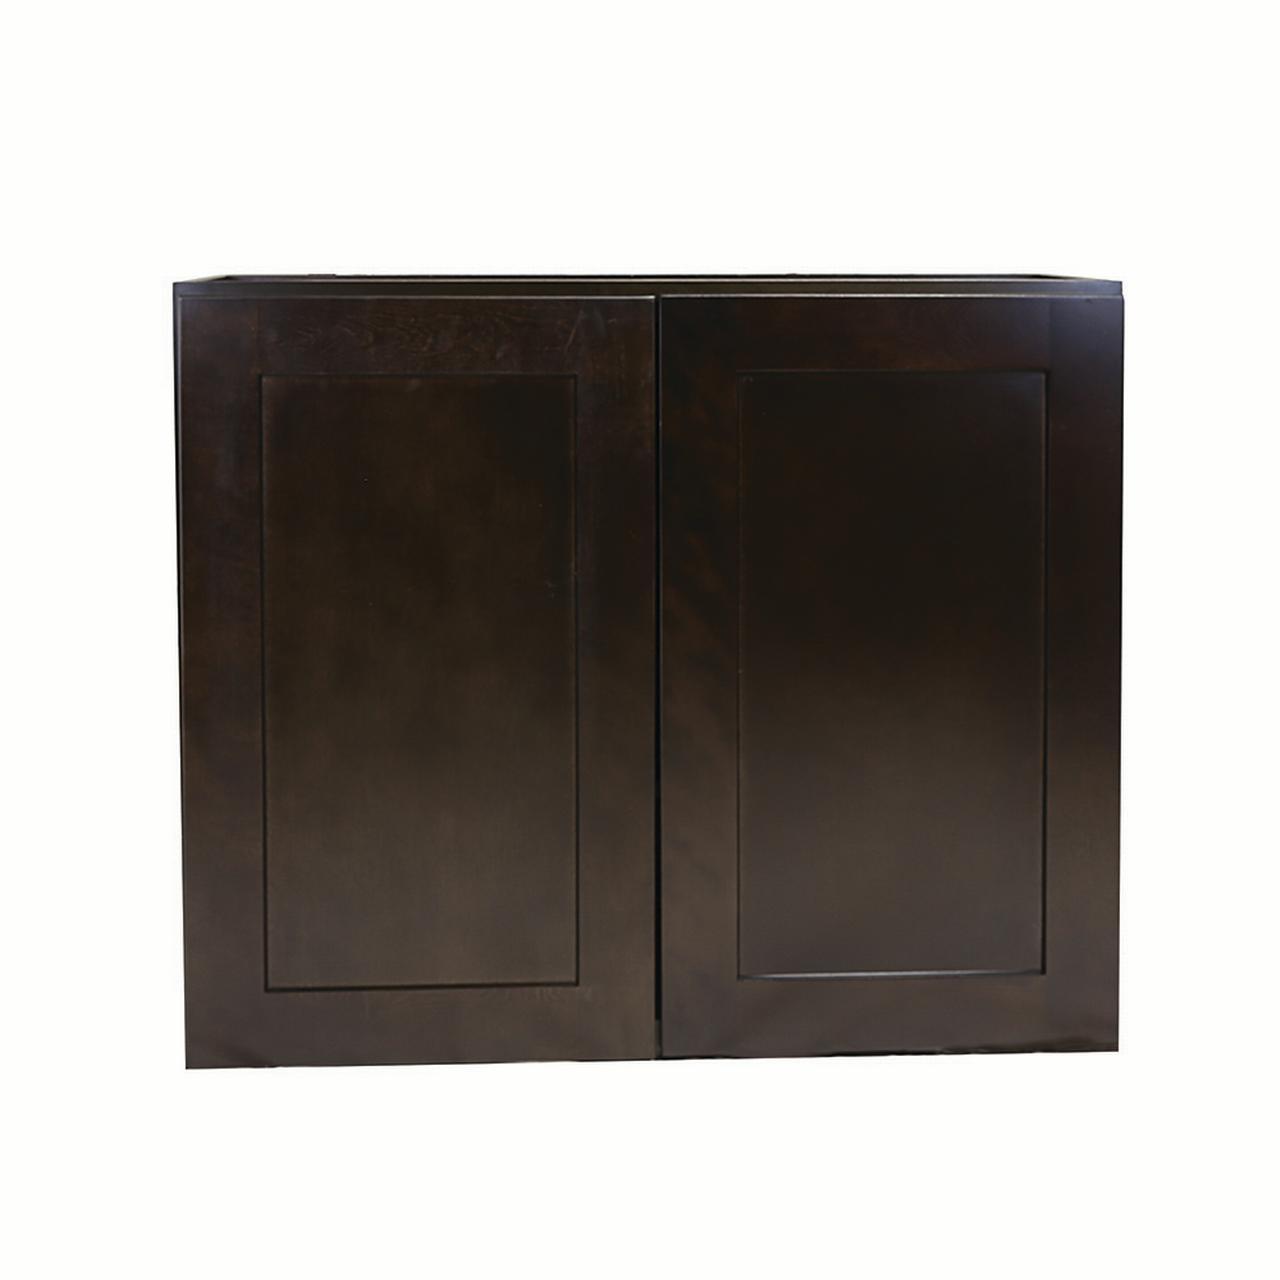 Design House 562355 Brookings Unassembled Shaker Tall Wall Kitchen Cabinet 36x30x12, Espresso